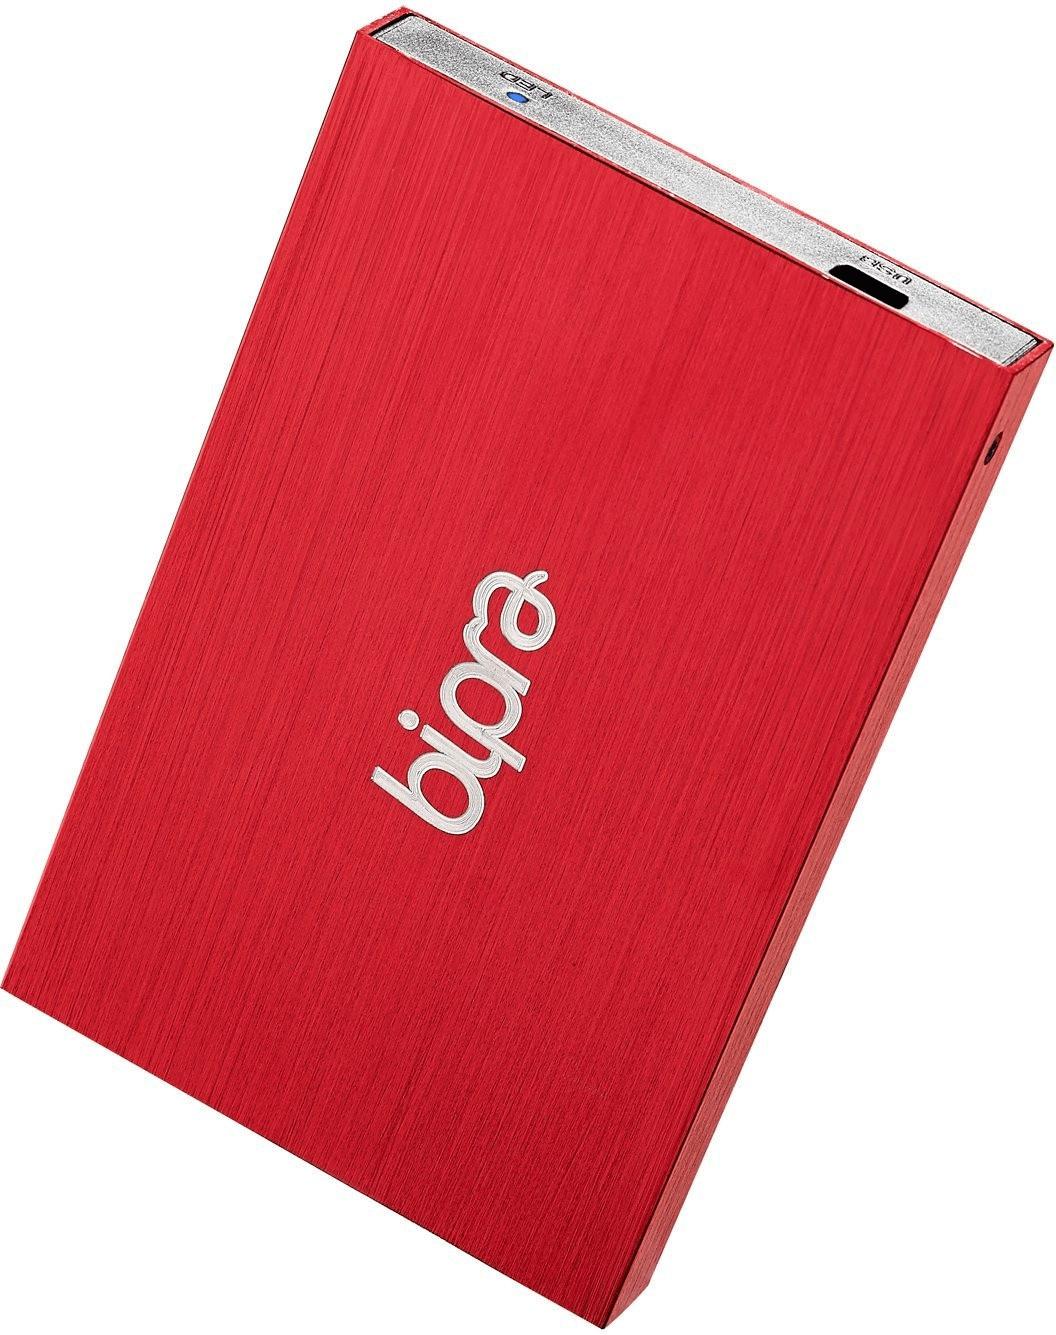 "Image of Bipra 2,5"" 400GB FAT32 USB 2.0"